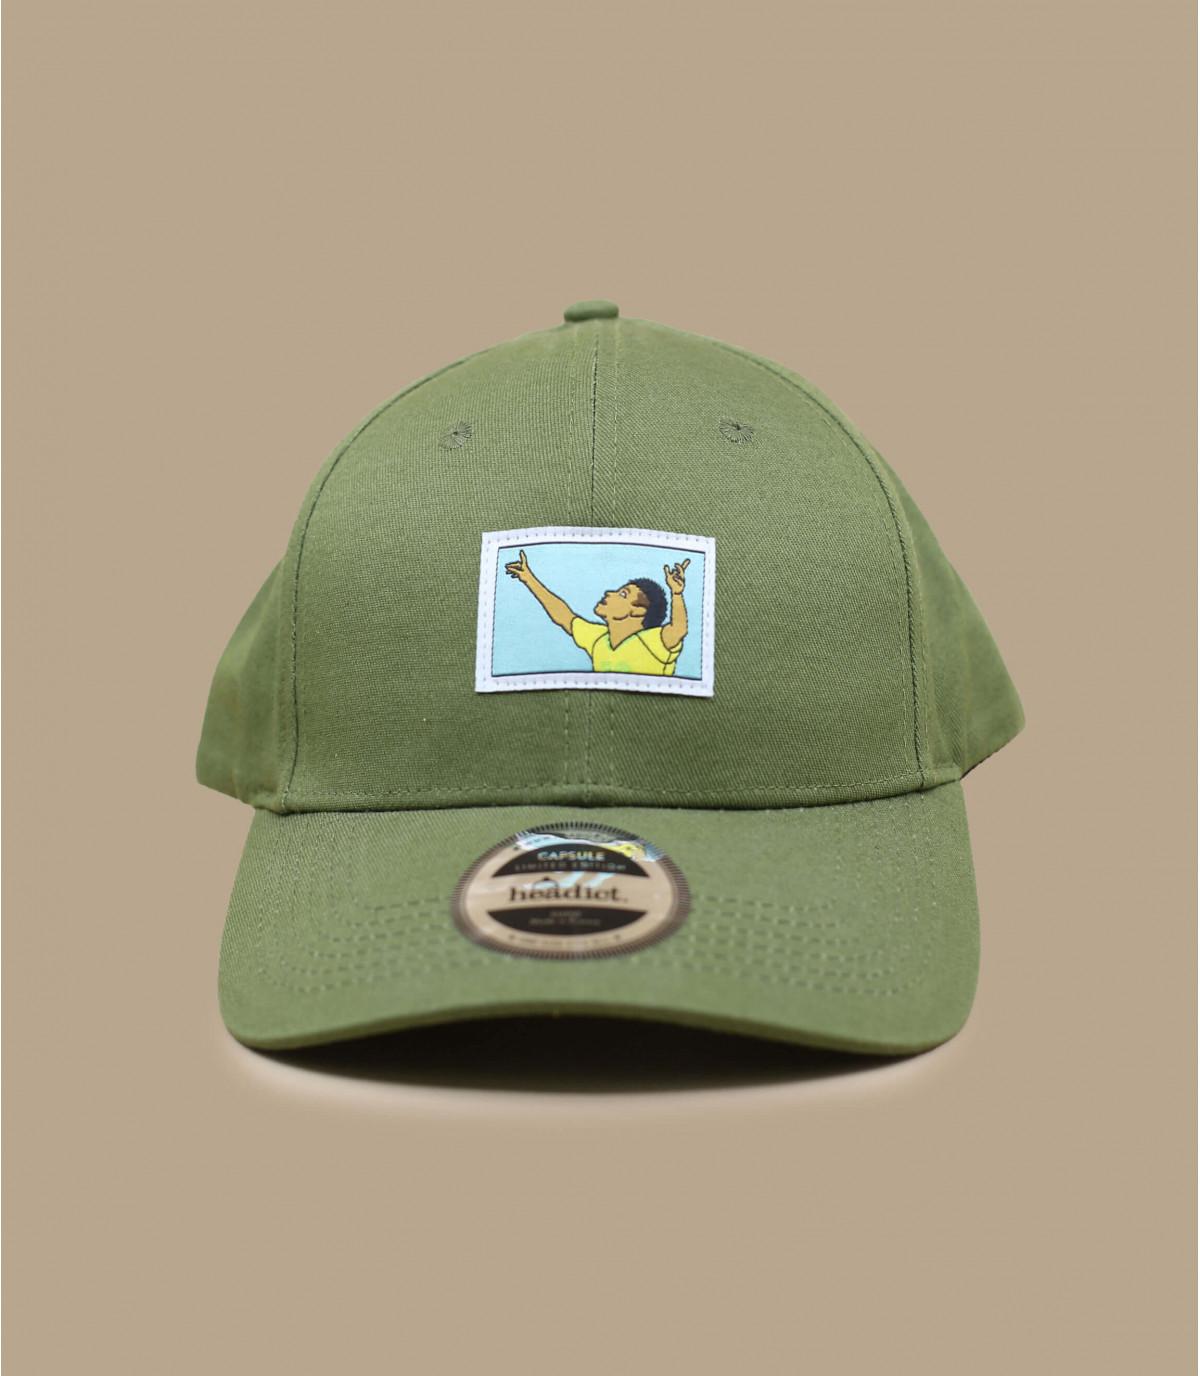 casquette Brésil n°10